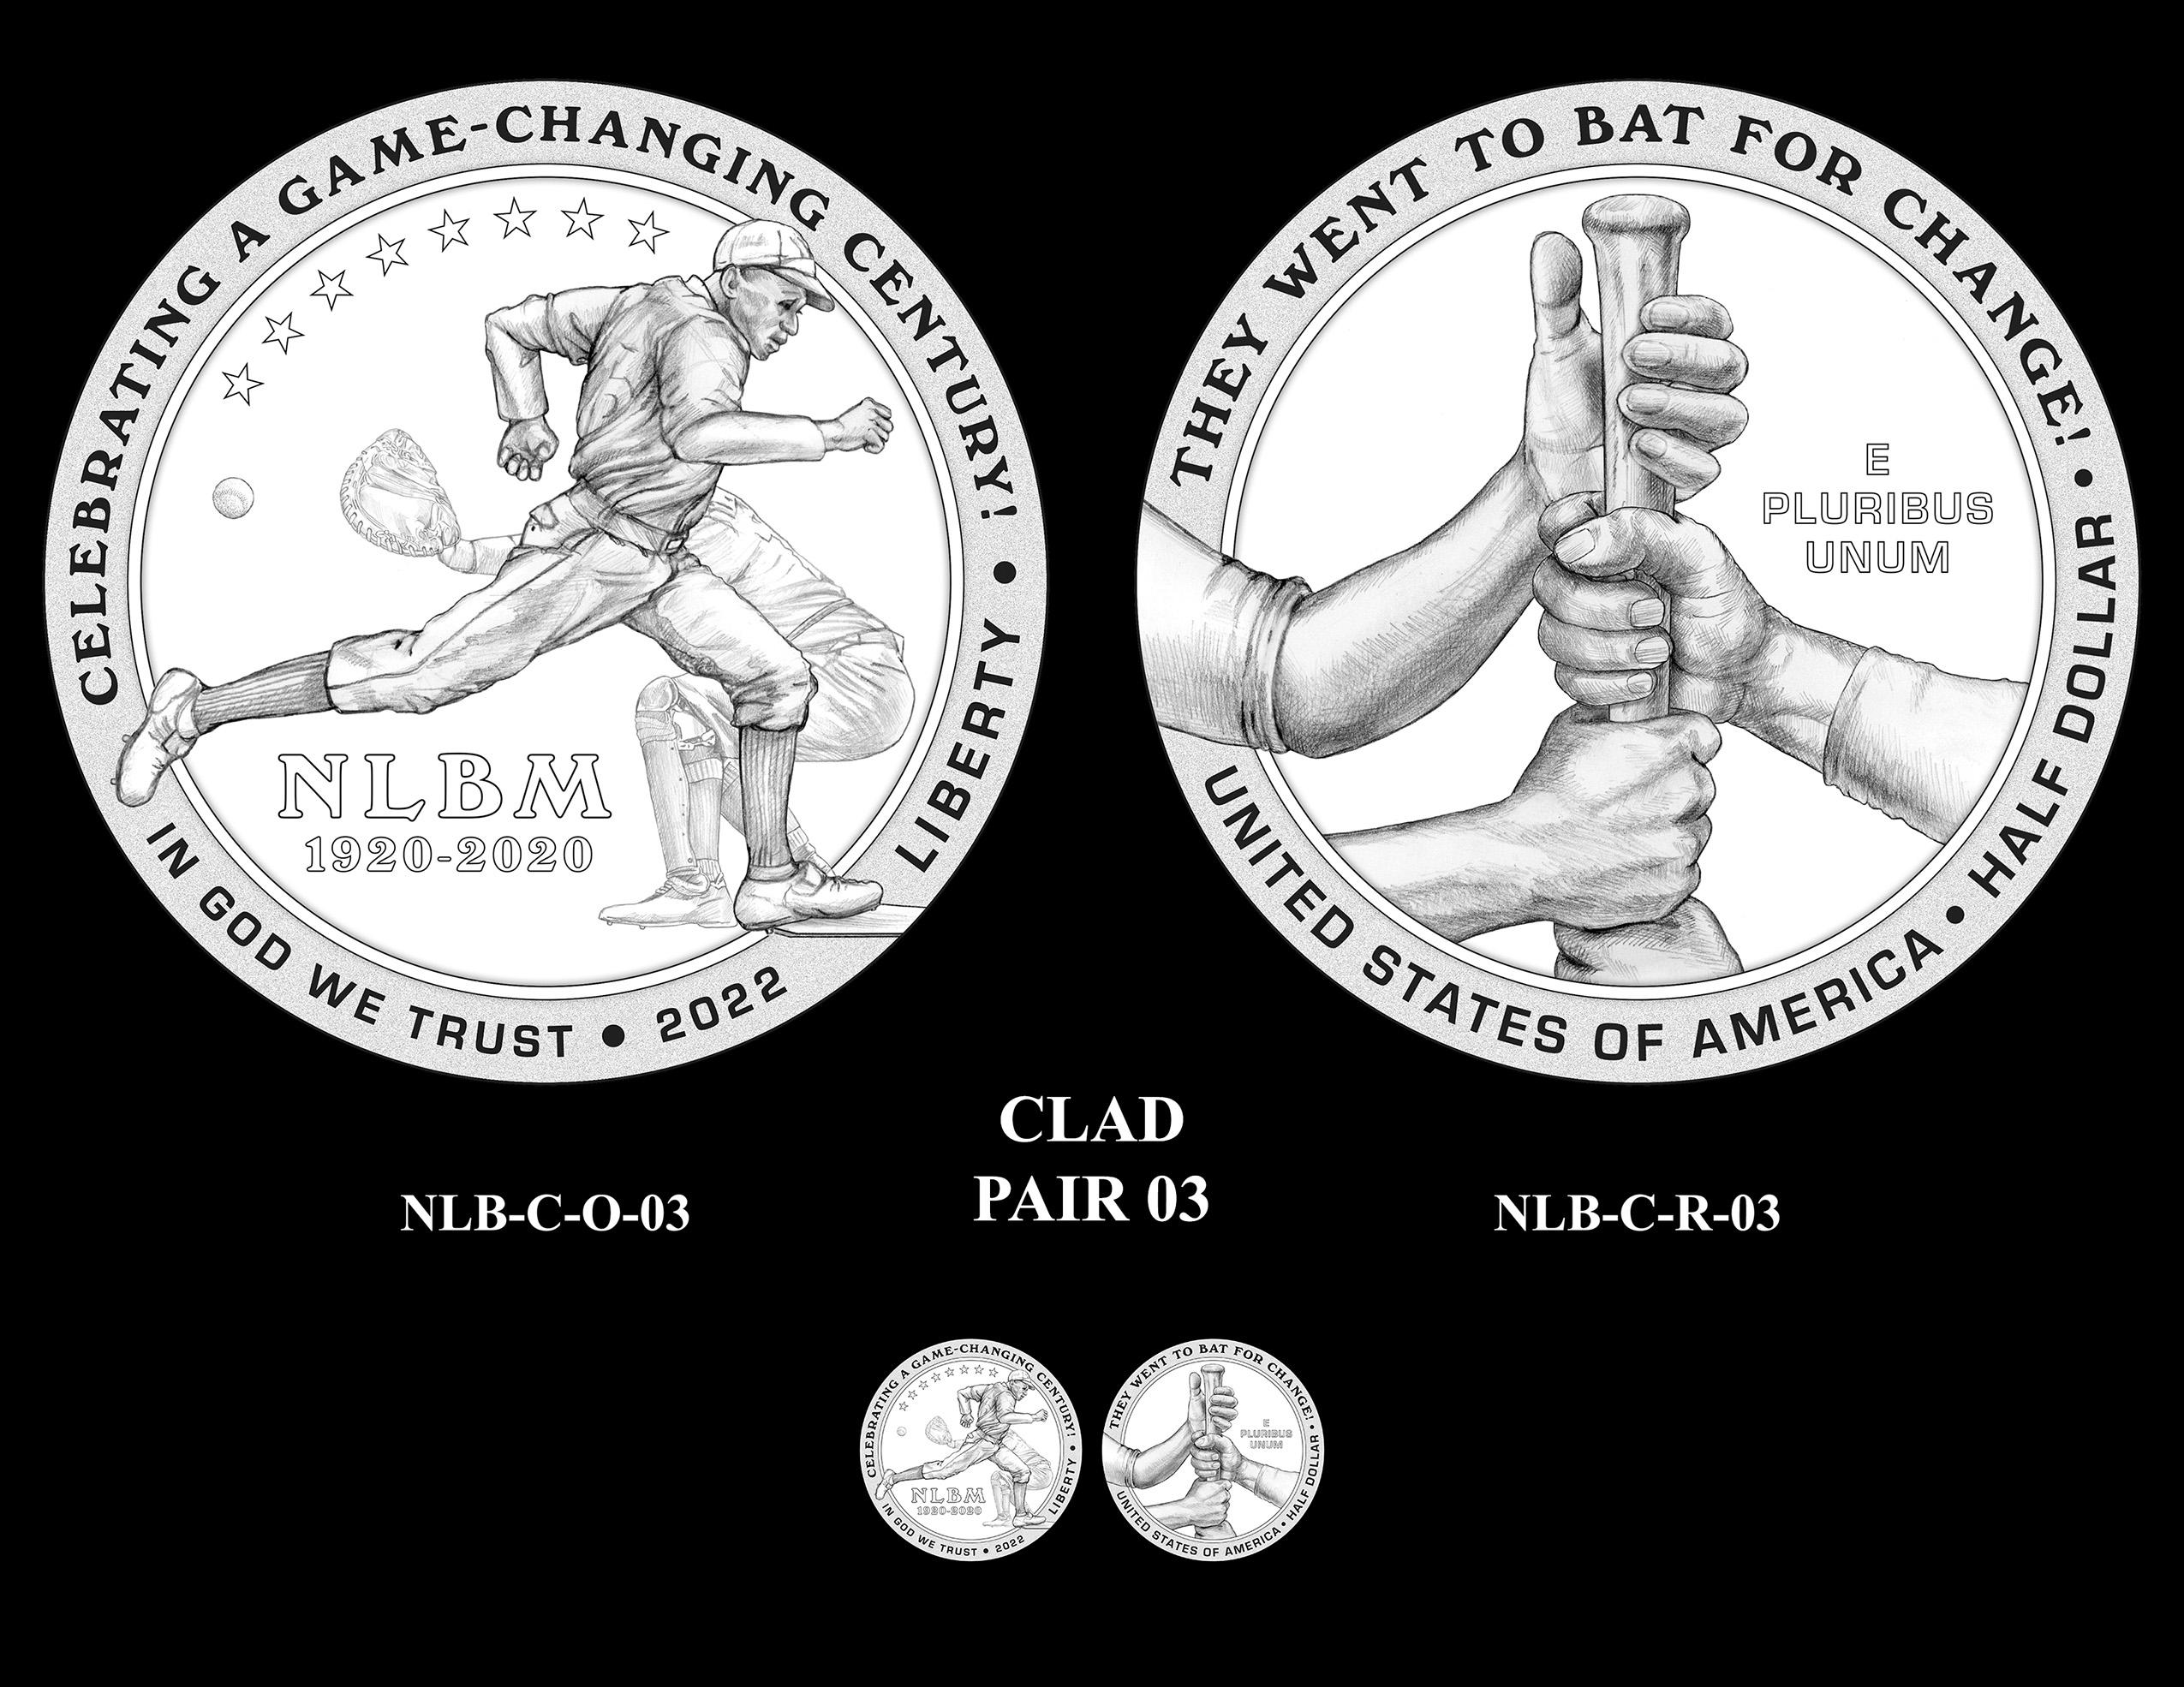 Clad Pair 03 -- Negro Leagues Baseball Commemorative Coin Program